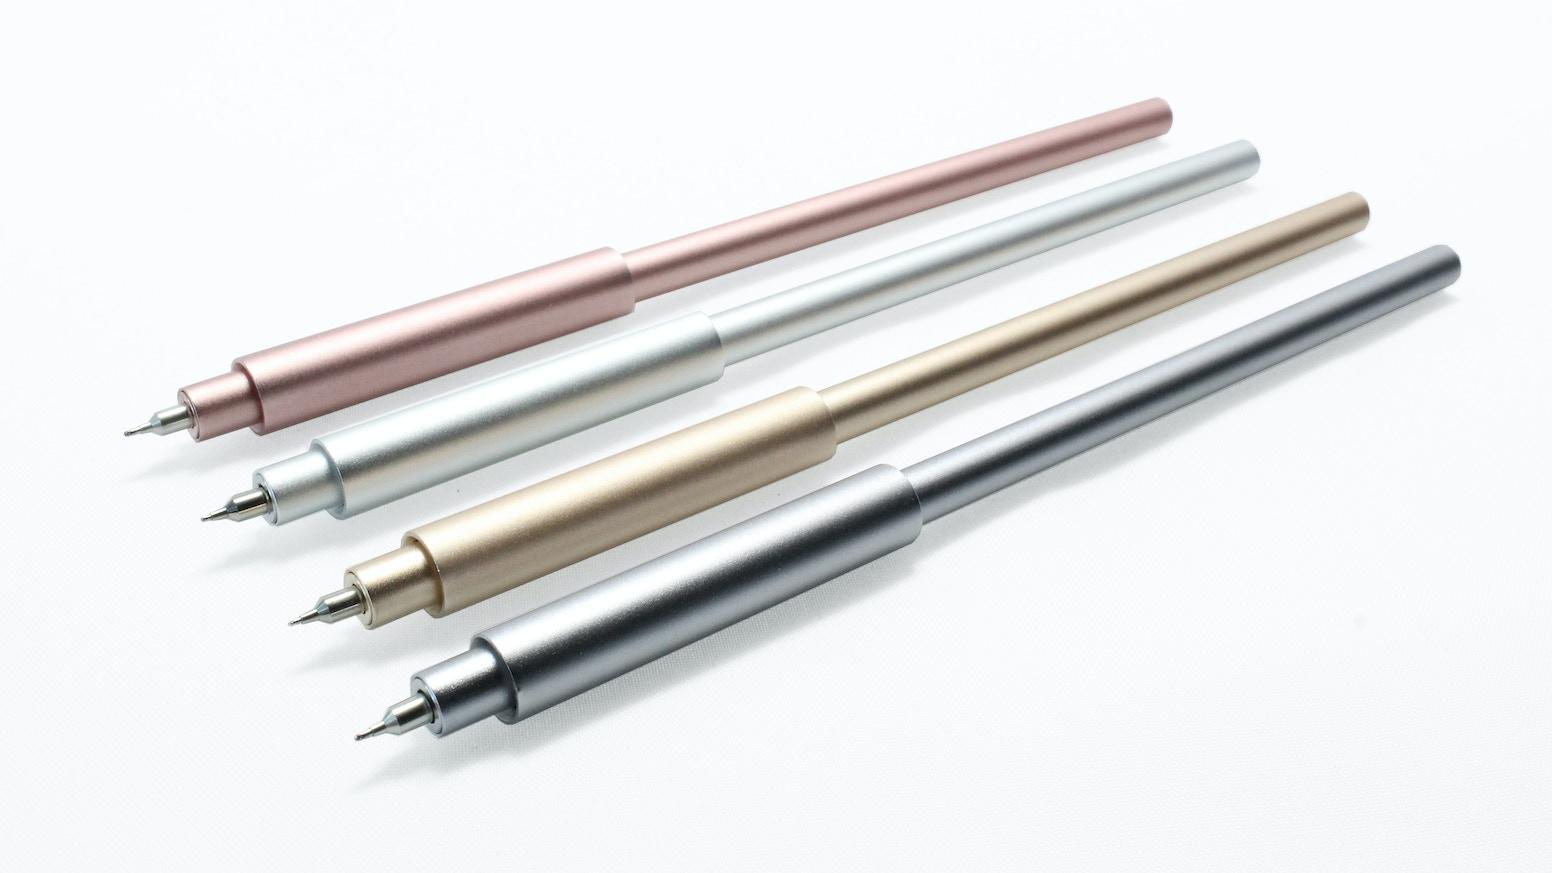 Pen Uno is a super slim all aluminum pen that uses the Hi-Tec-C Coleto gel ink cartridge.